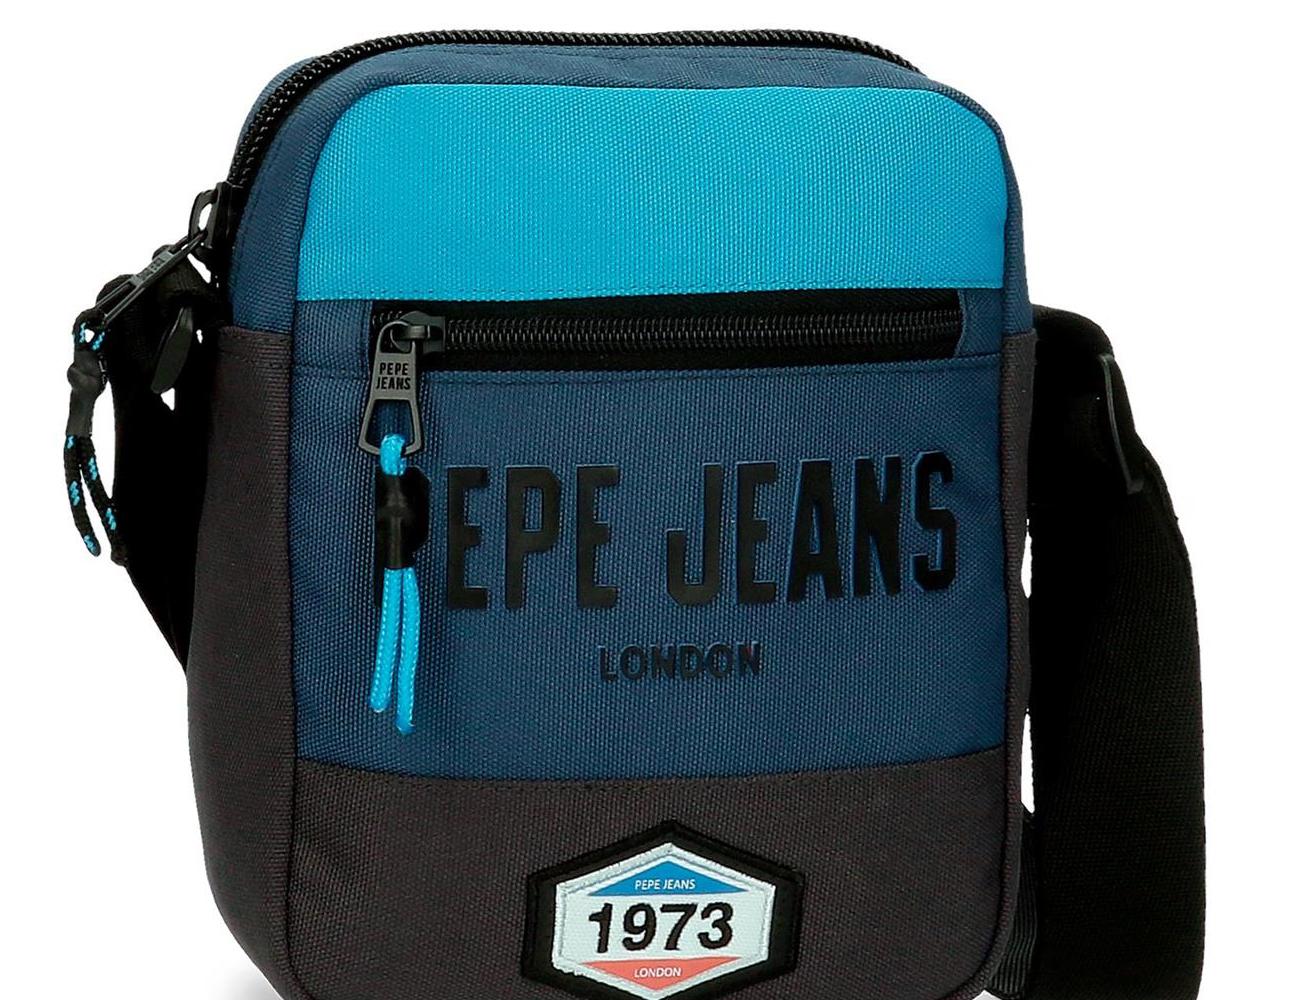 6295521 Bandolera 21 cm Pepe Jeans Skyler